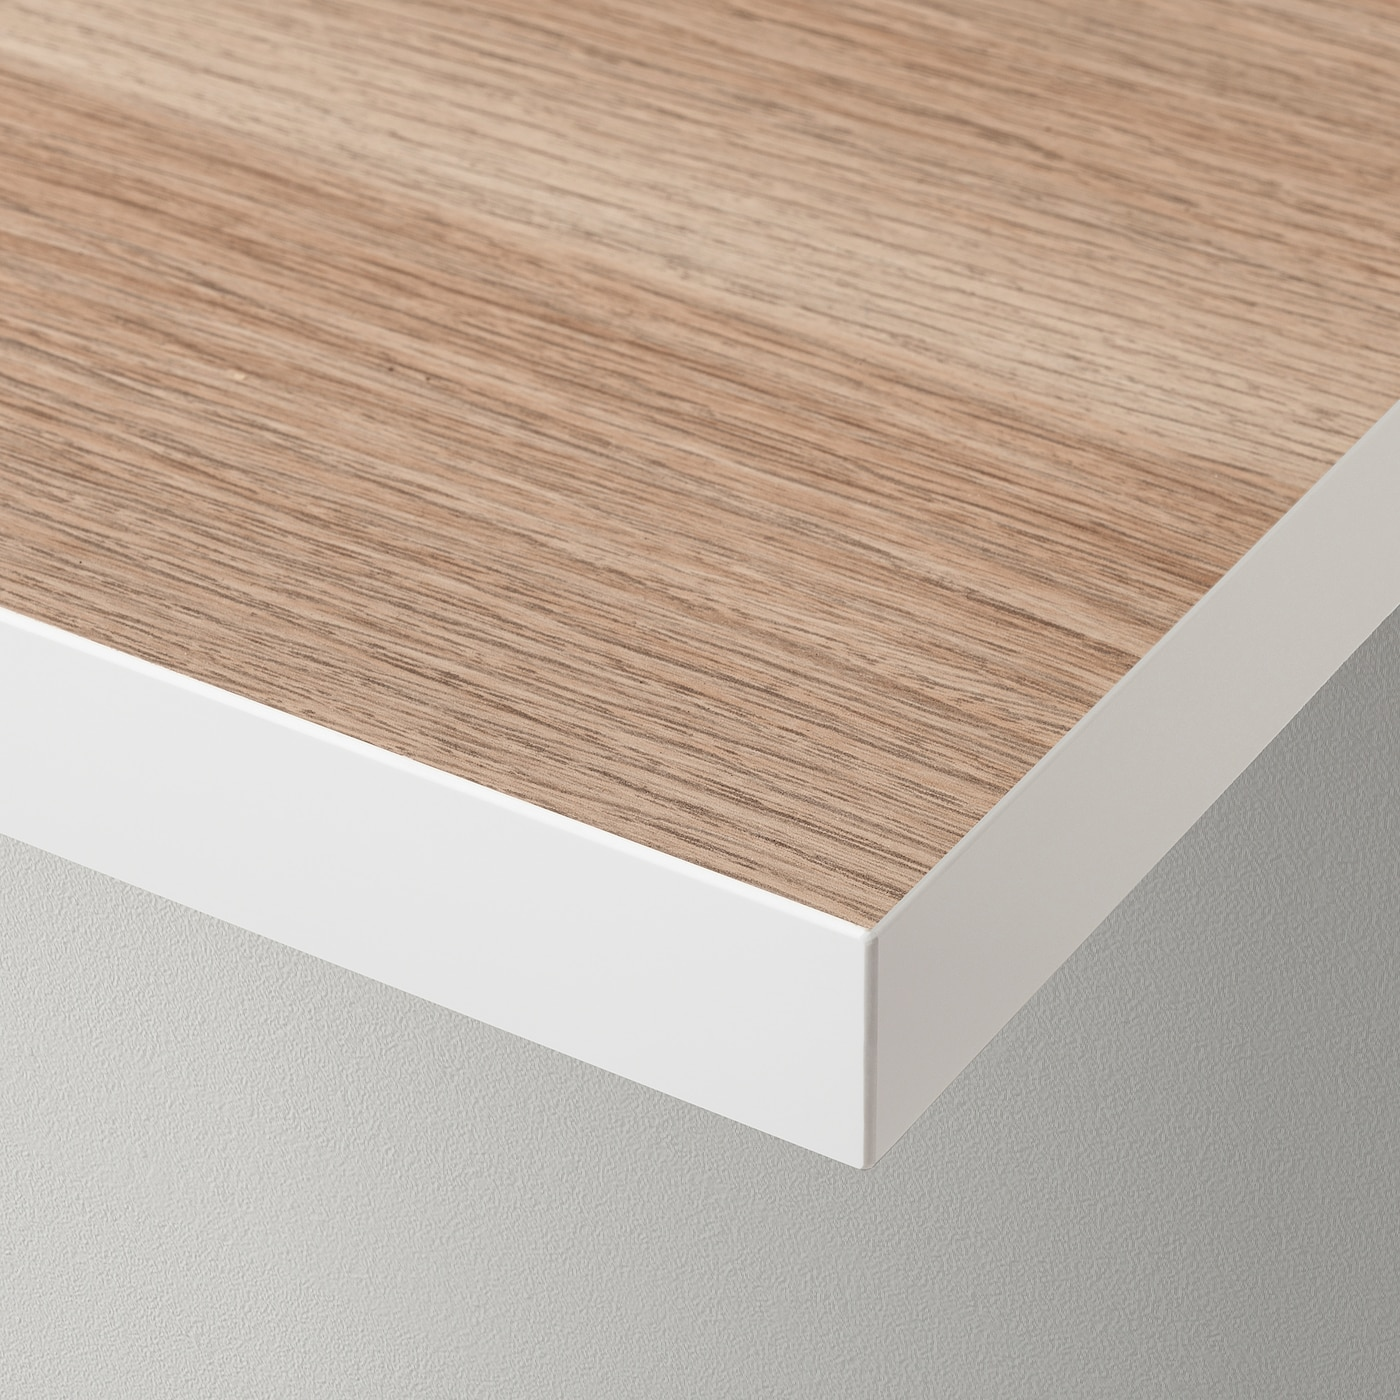 LINNMON Tablero blancoefecto roble tinte blanco 150x75 cm